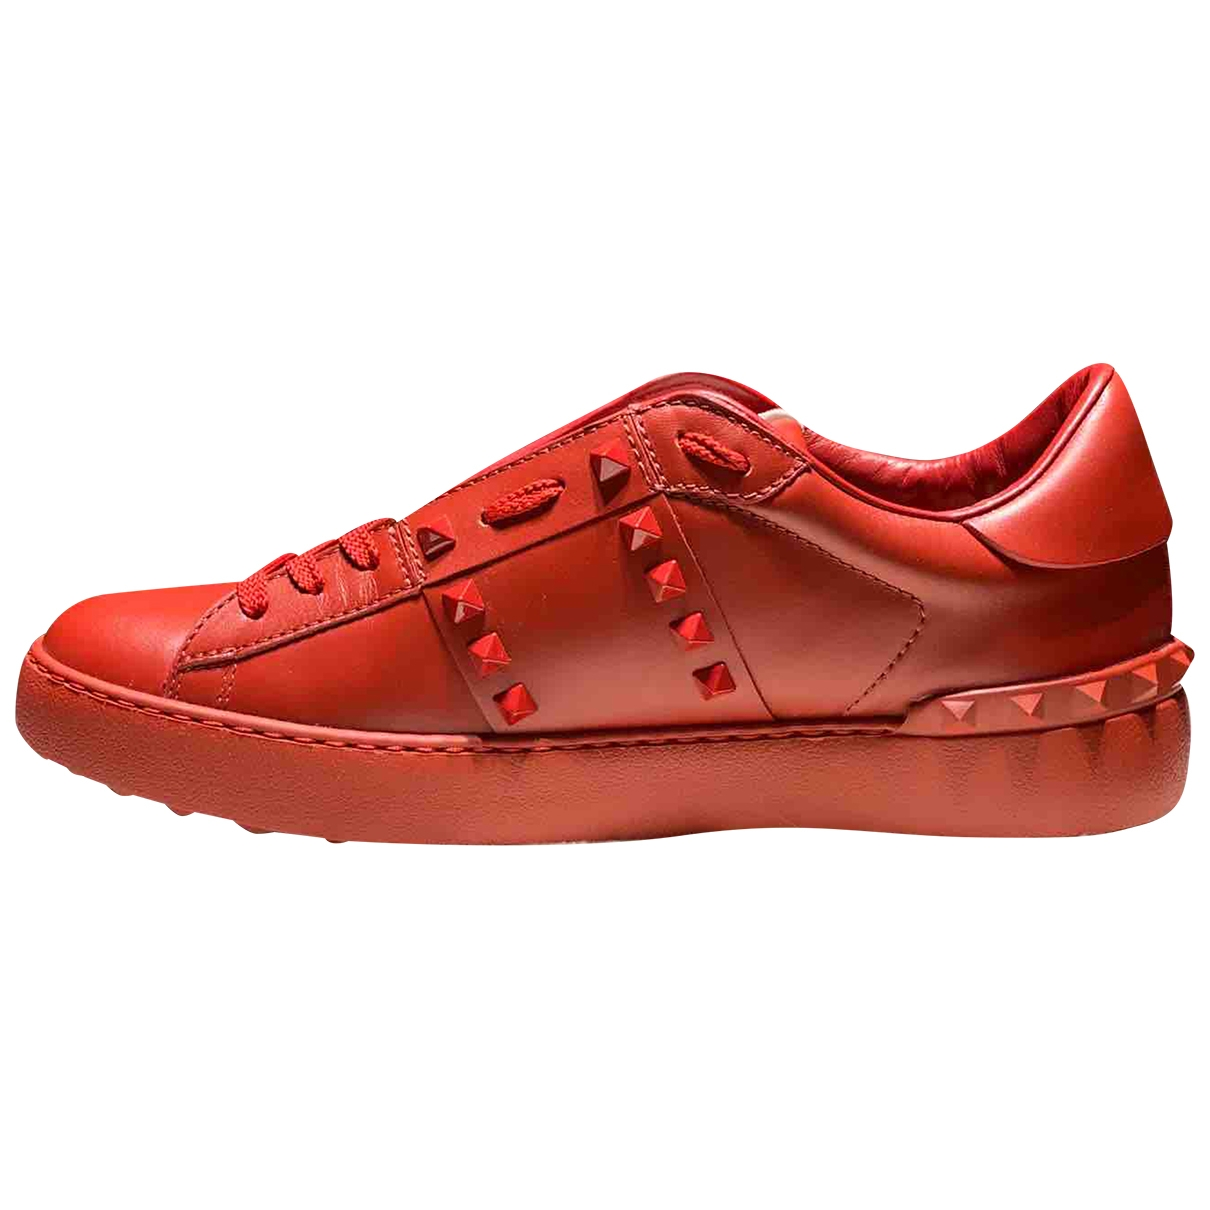 Valentino Garavani Rockstud Red Leather Trainers for Women 41 EU